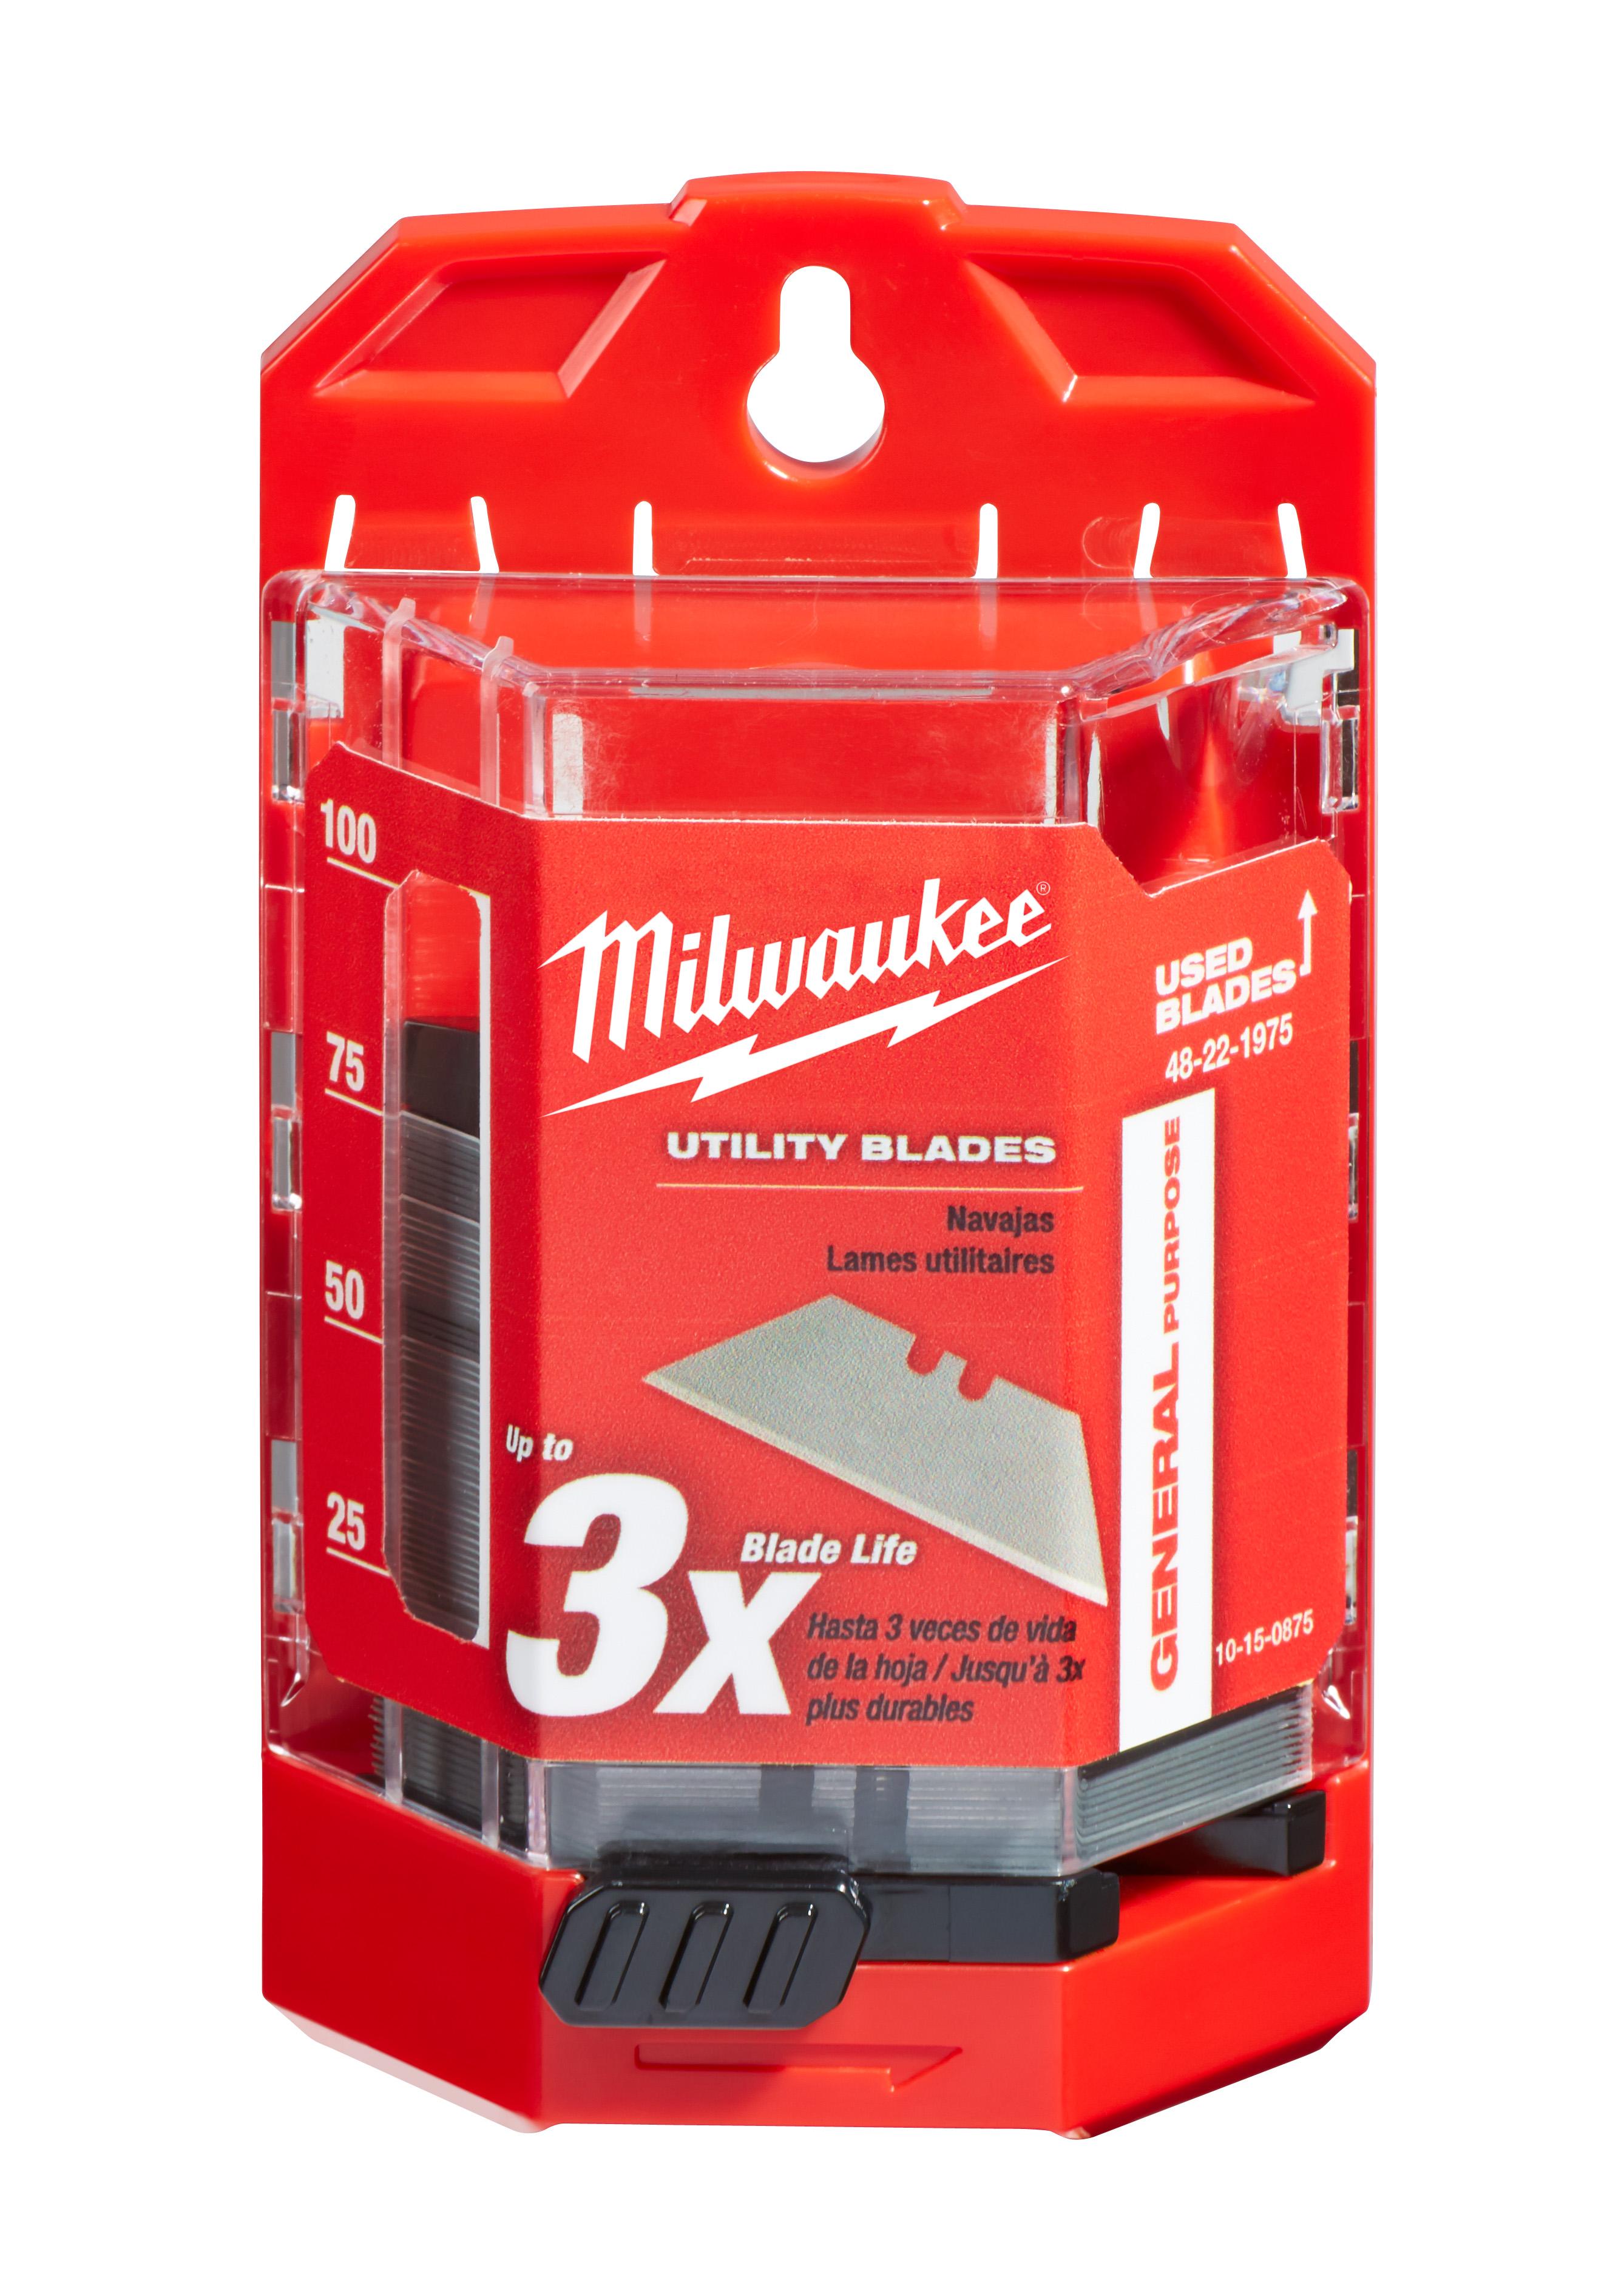 Milwaukee 48-22-1975 75-Piece General Purpose Utility Blades w/ Dispenser